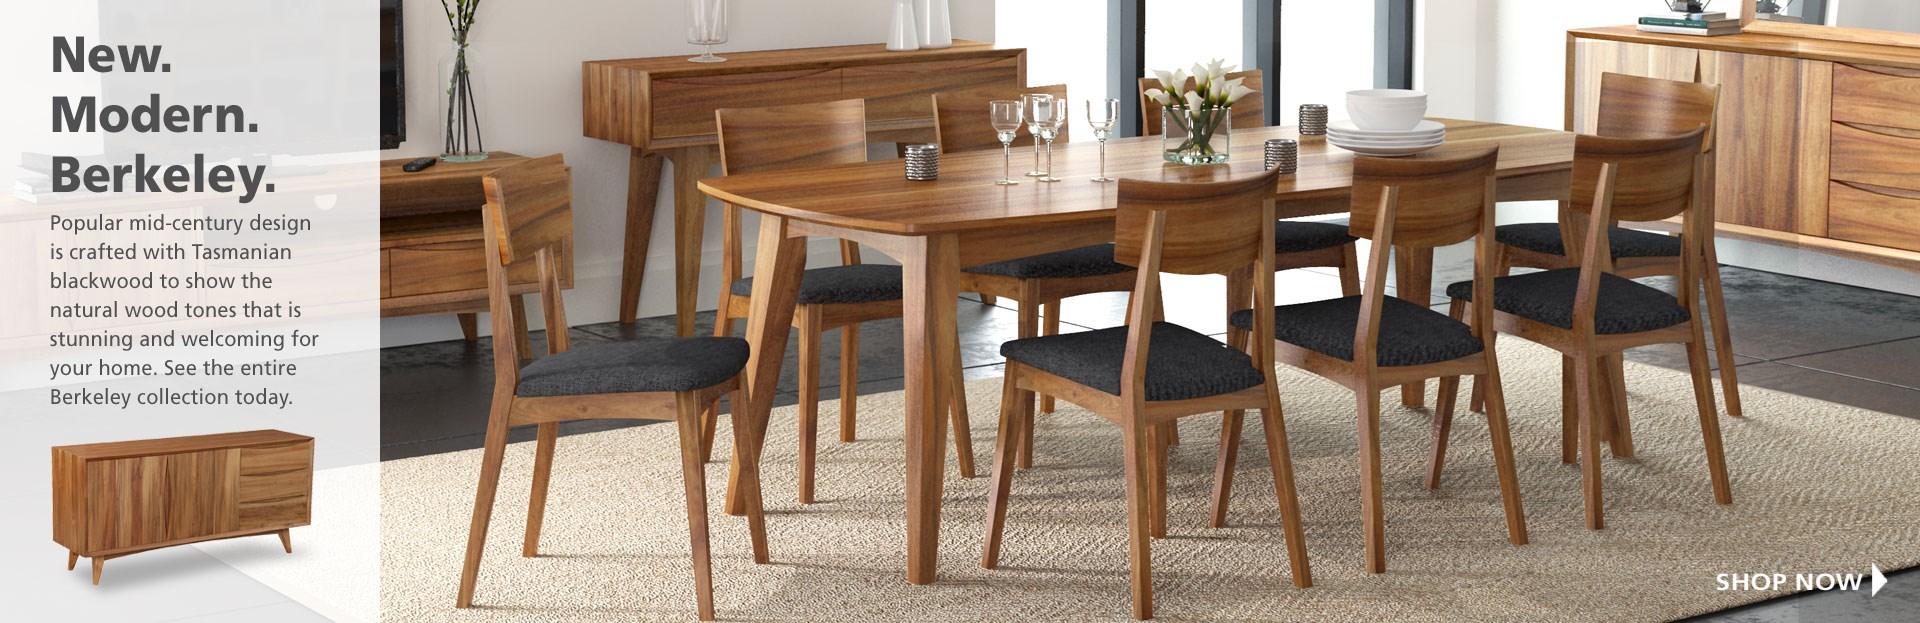 Berkeley dining table and chairs. HomeWorld Furniture   Hawaii  Oahu  Hilo  Kona  Maui Furniture Store